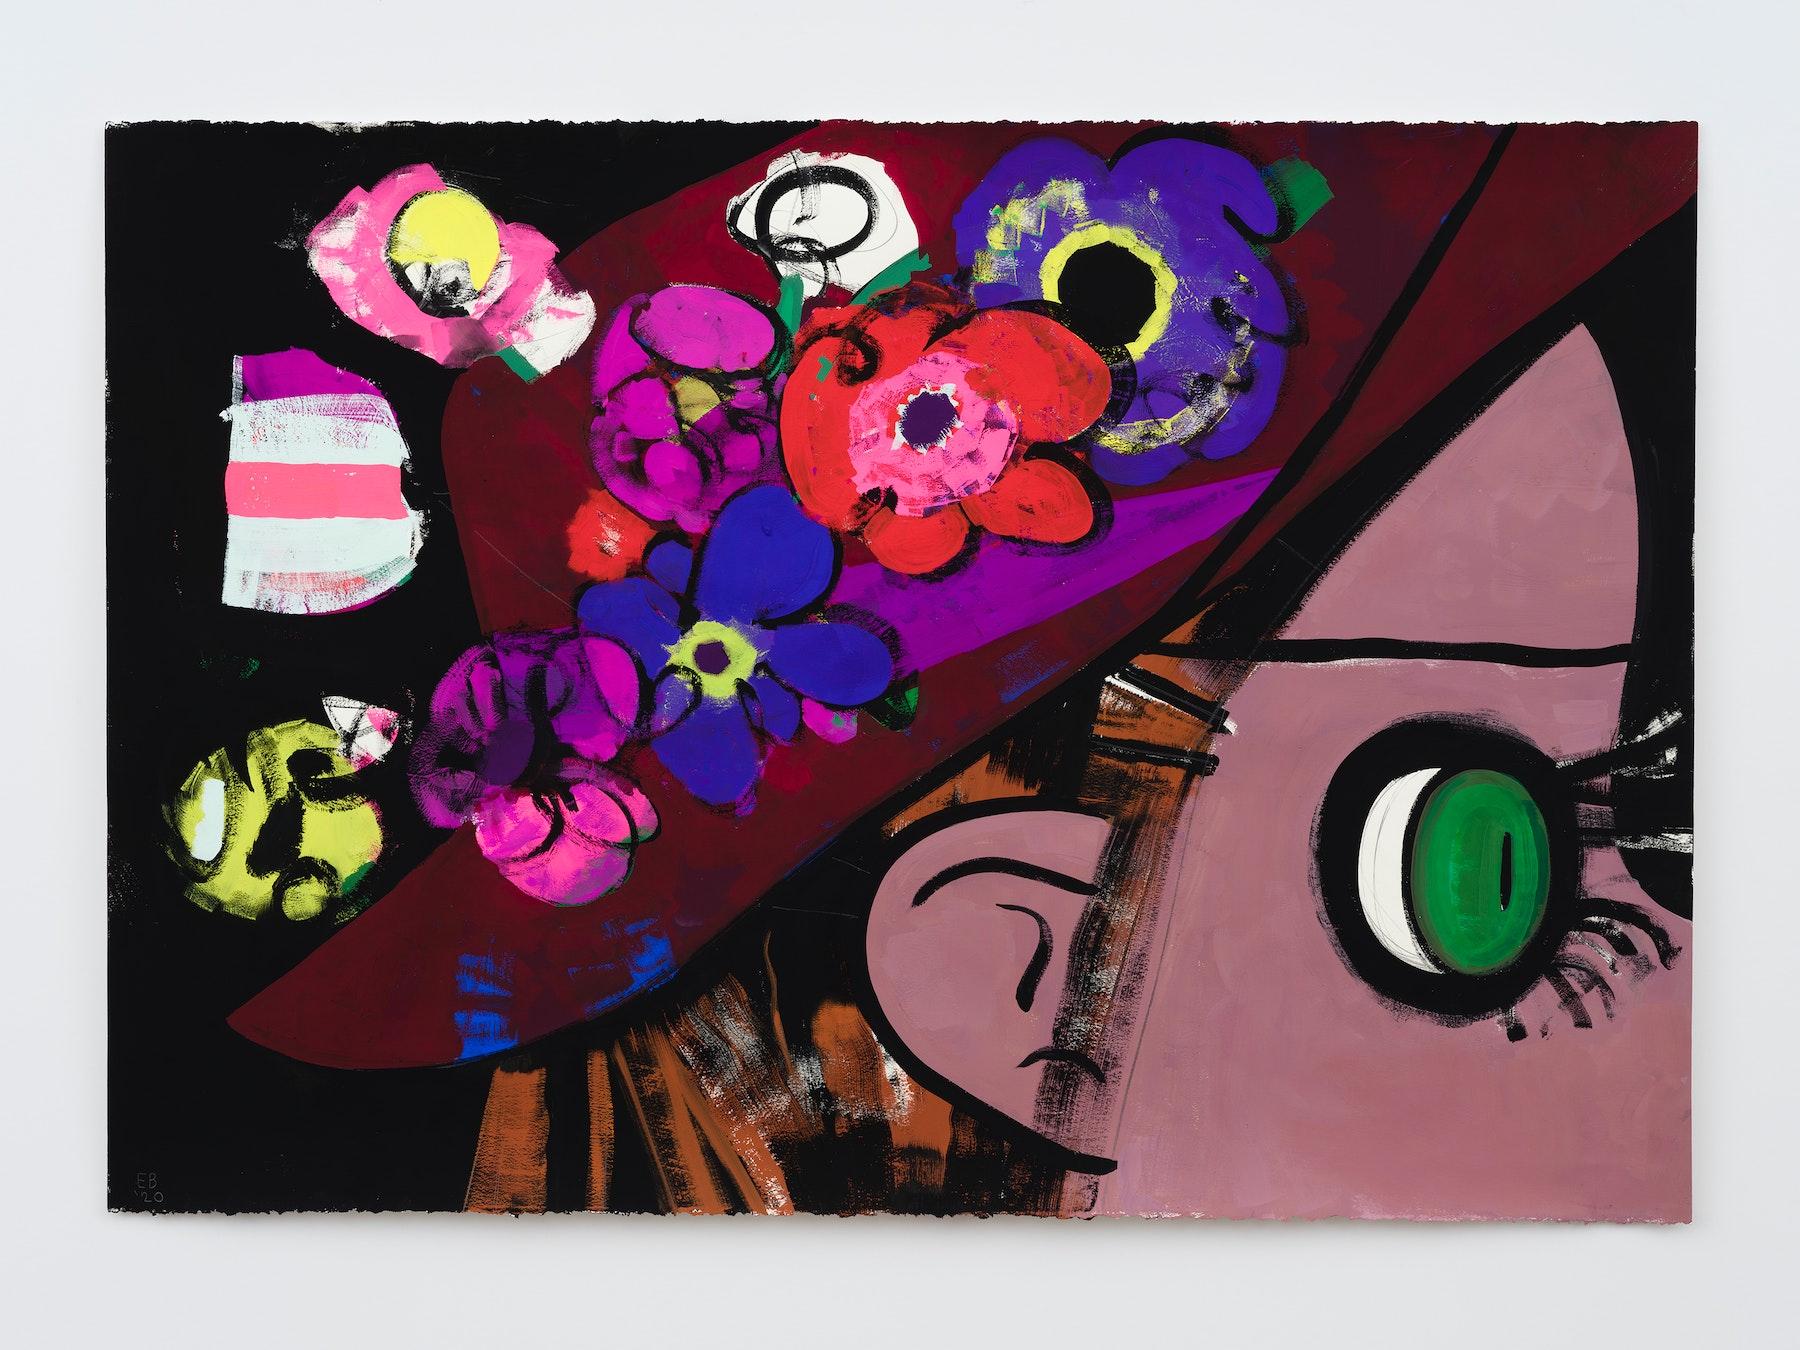 "Ellen Berkenblit ""Jello and Petit Fours,"" 2020 Gouache and graphite on Legion Stonehenge paper 30"" x 44"" [HxW] (76.2 x 111.76 cm); 33"" x 46 ¹⁄₂"" x 1 ¹⁄₂"" [HxWxD] (83.82 x 118.11 x 3.81 cm) framed Inventory #BER197 Courtesy of the artist and Vielmetter Los Angeles Photo credit: Jeff Mclane Signed ""EB '20"" Collection of Philipe Leonardo; Denver, CO, USA"